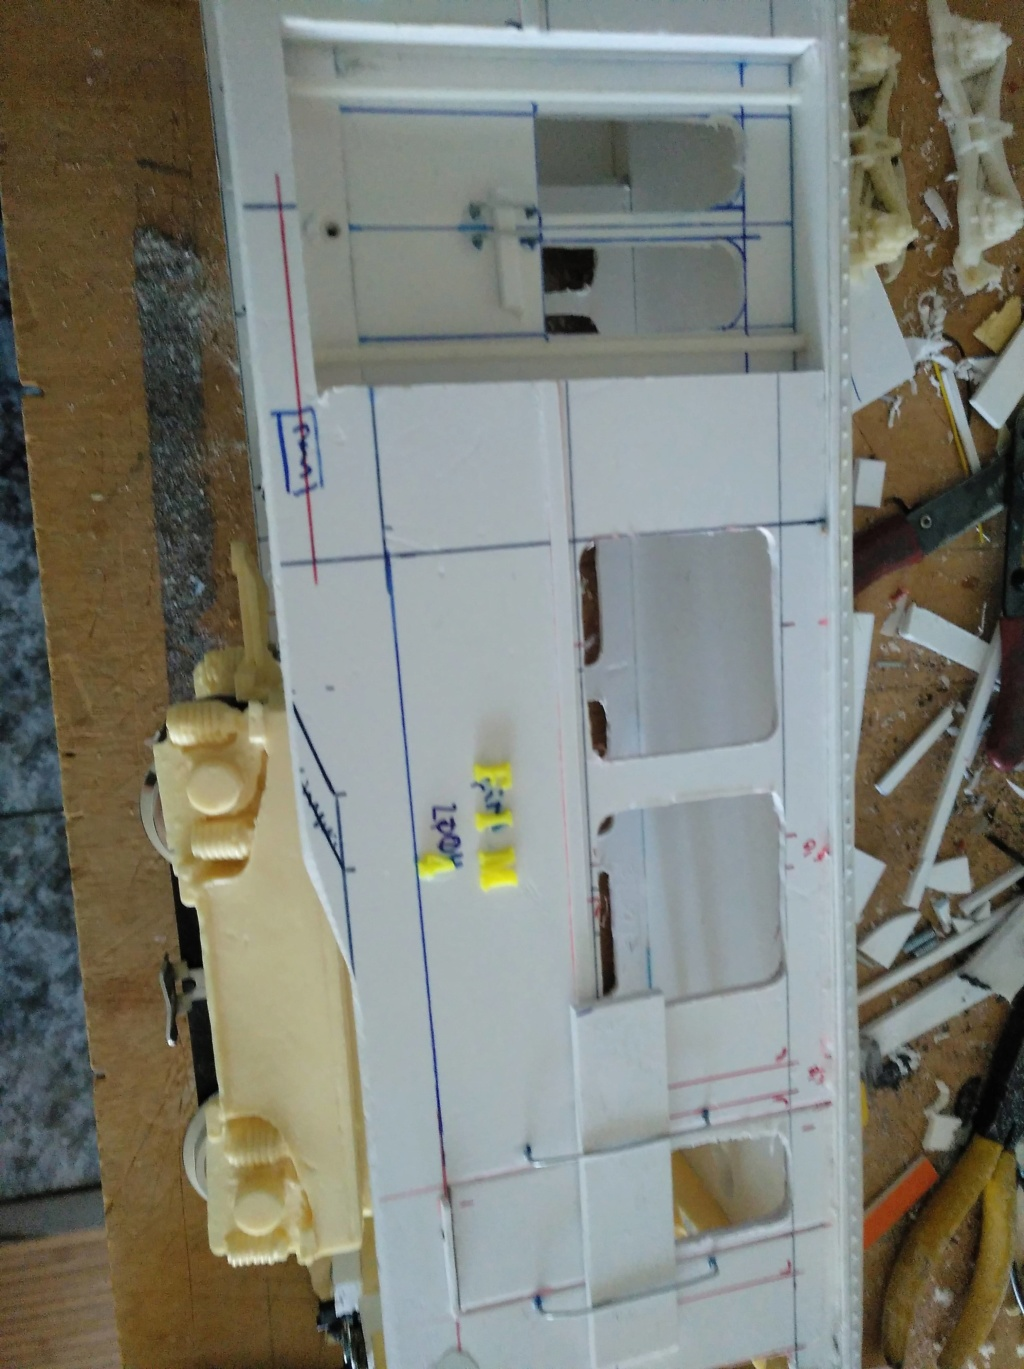 Projecte Automotor Billard A 150 D7 - Página 7 Img_2505